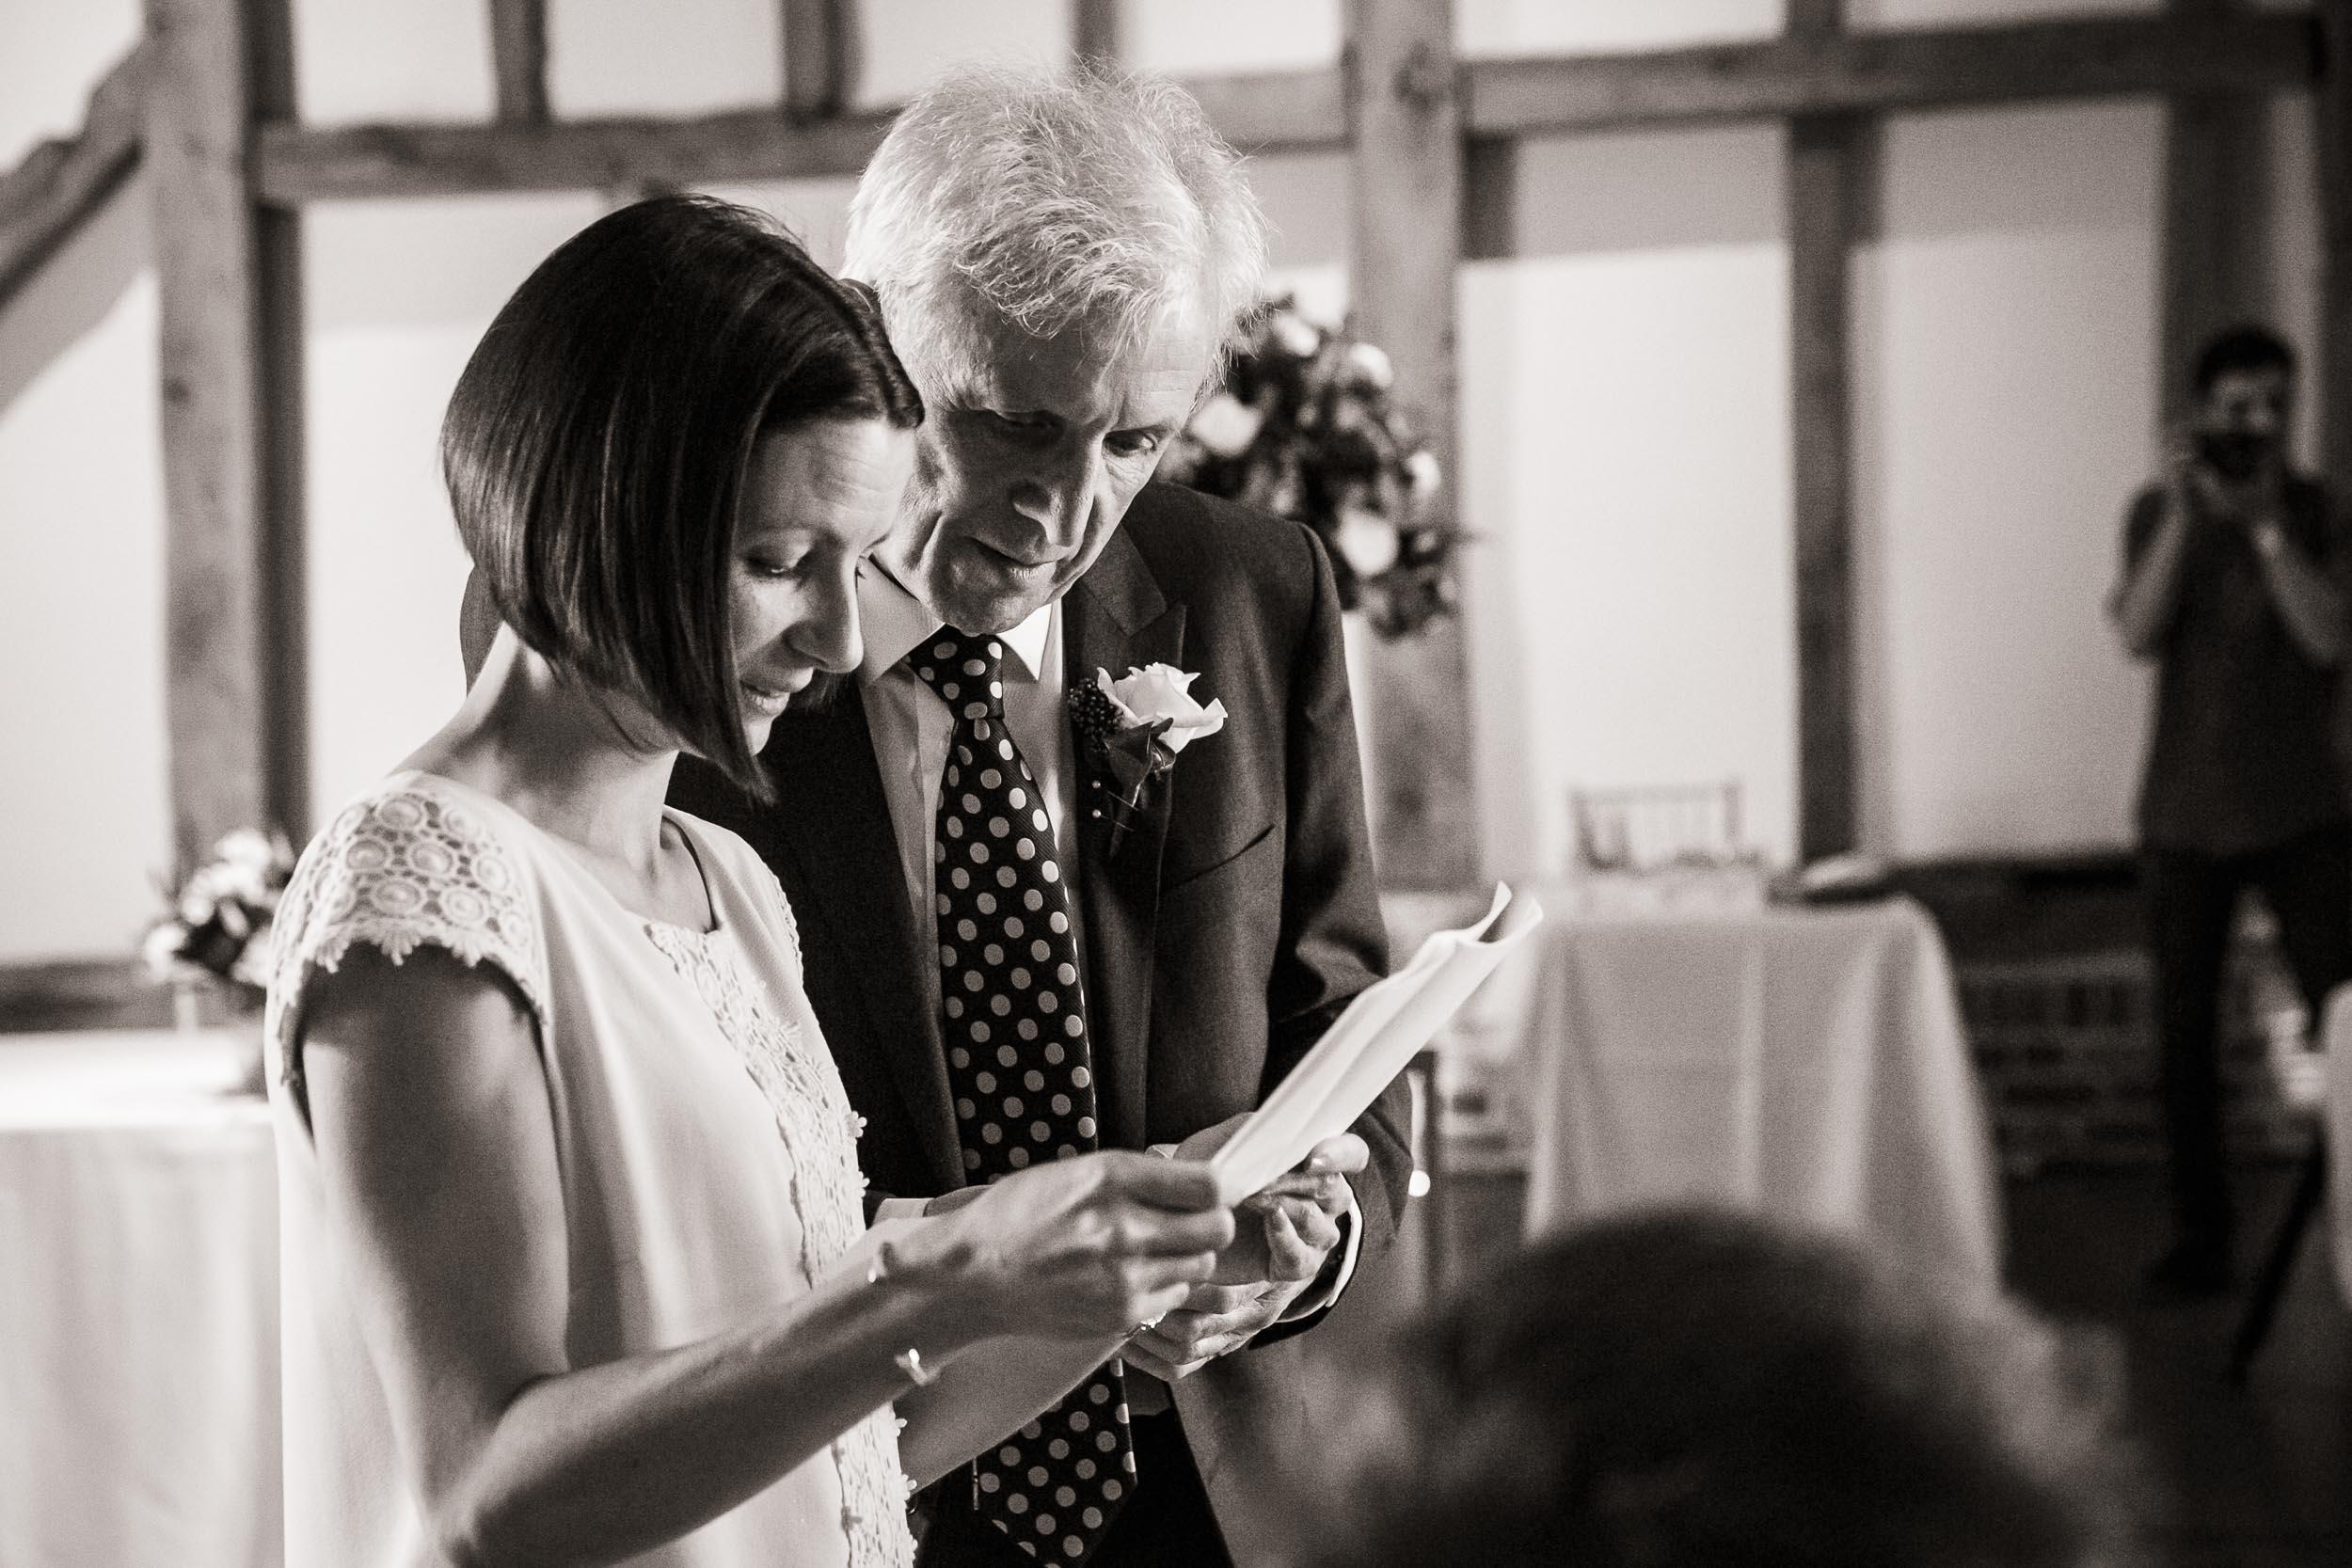 micklefield-hall-wedding-photographer 017.jpg